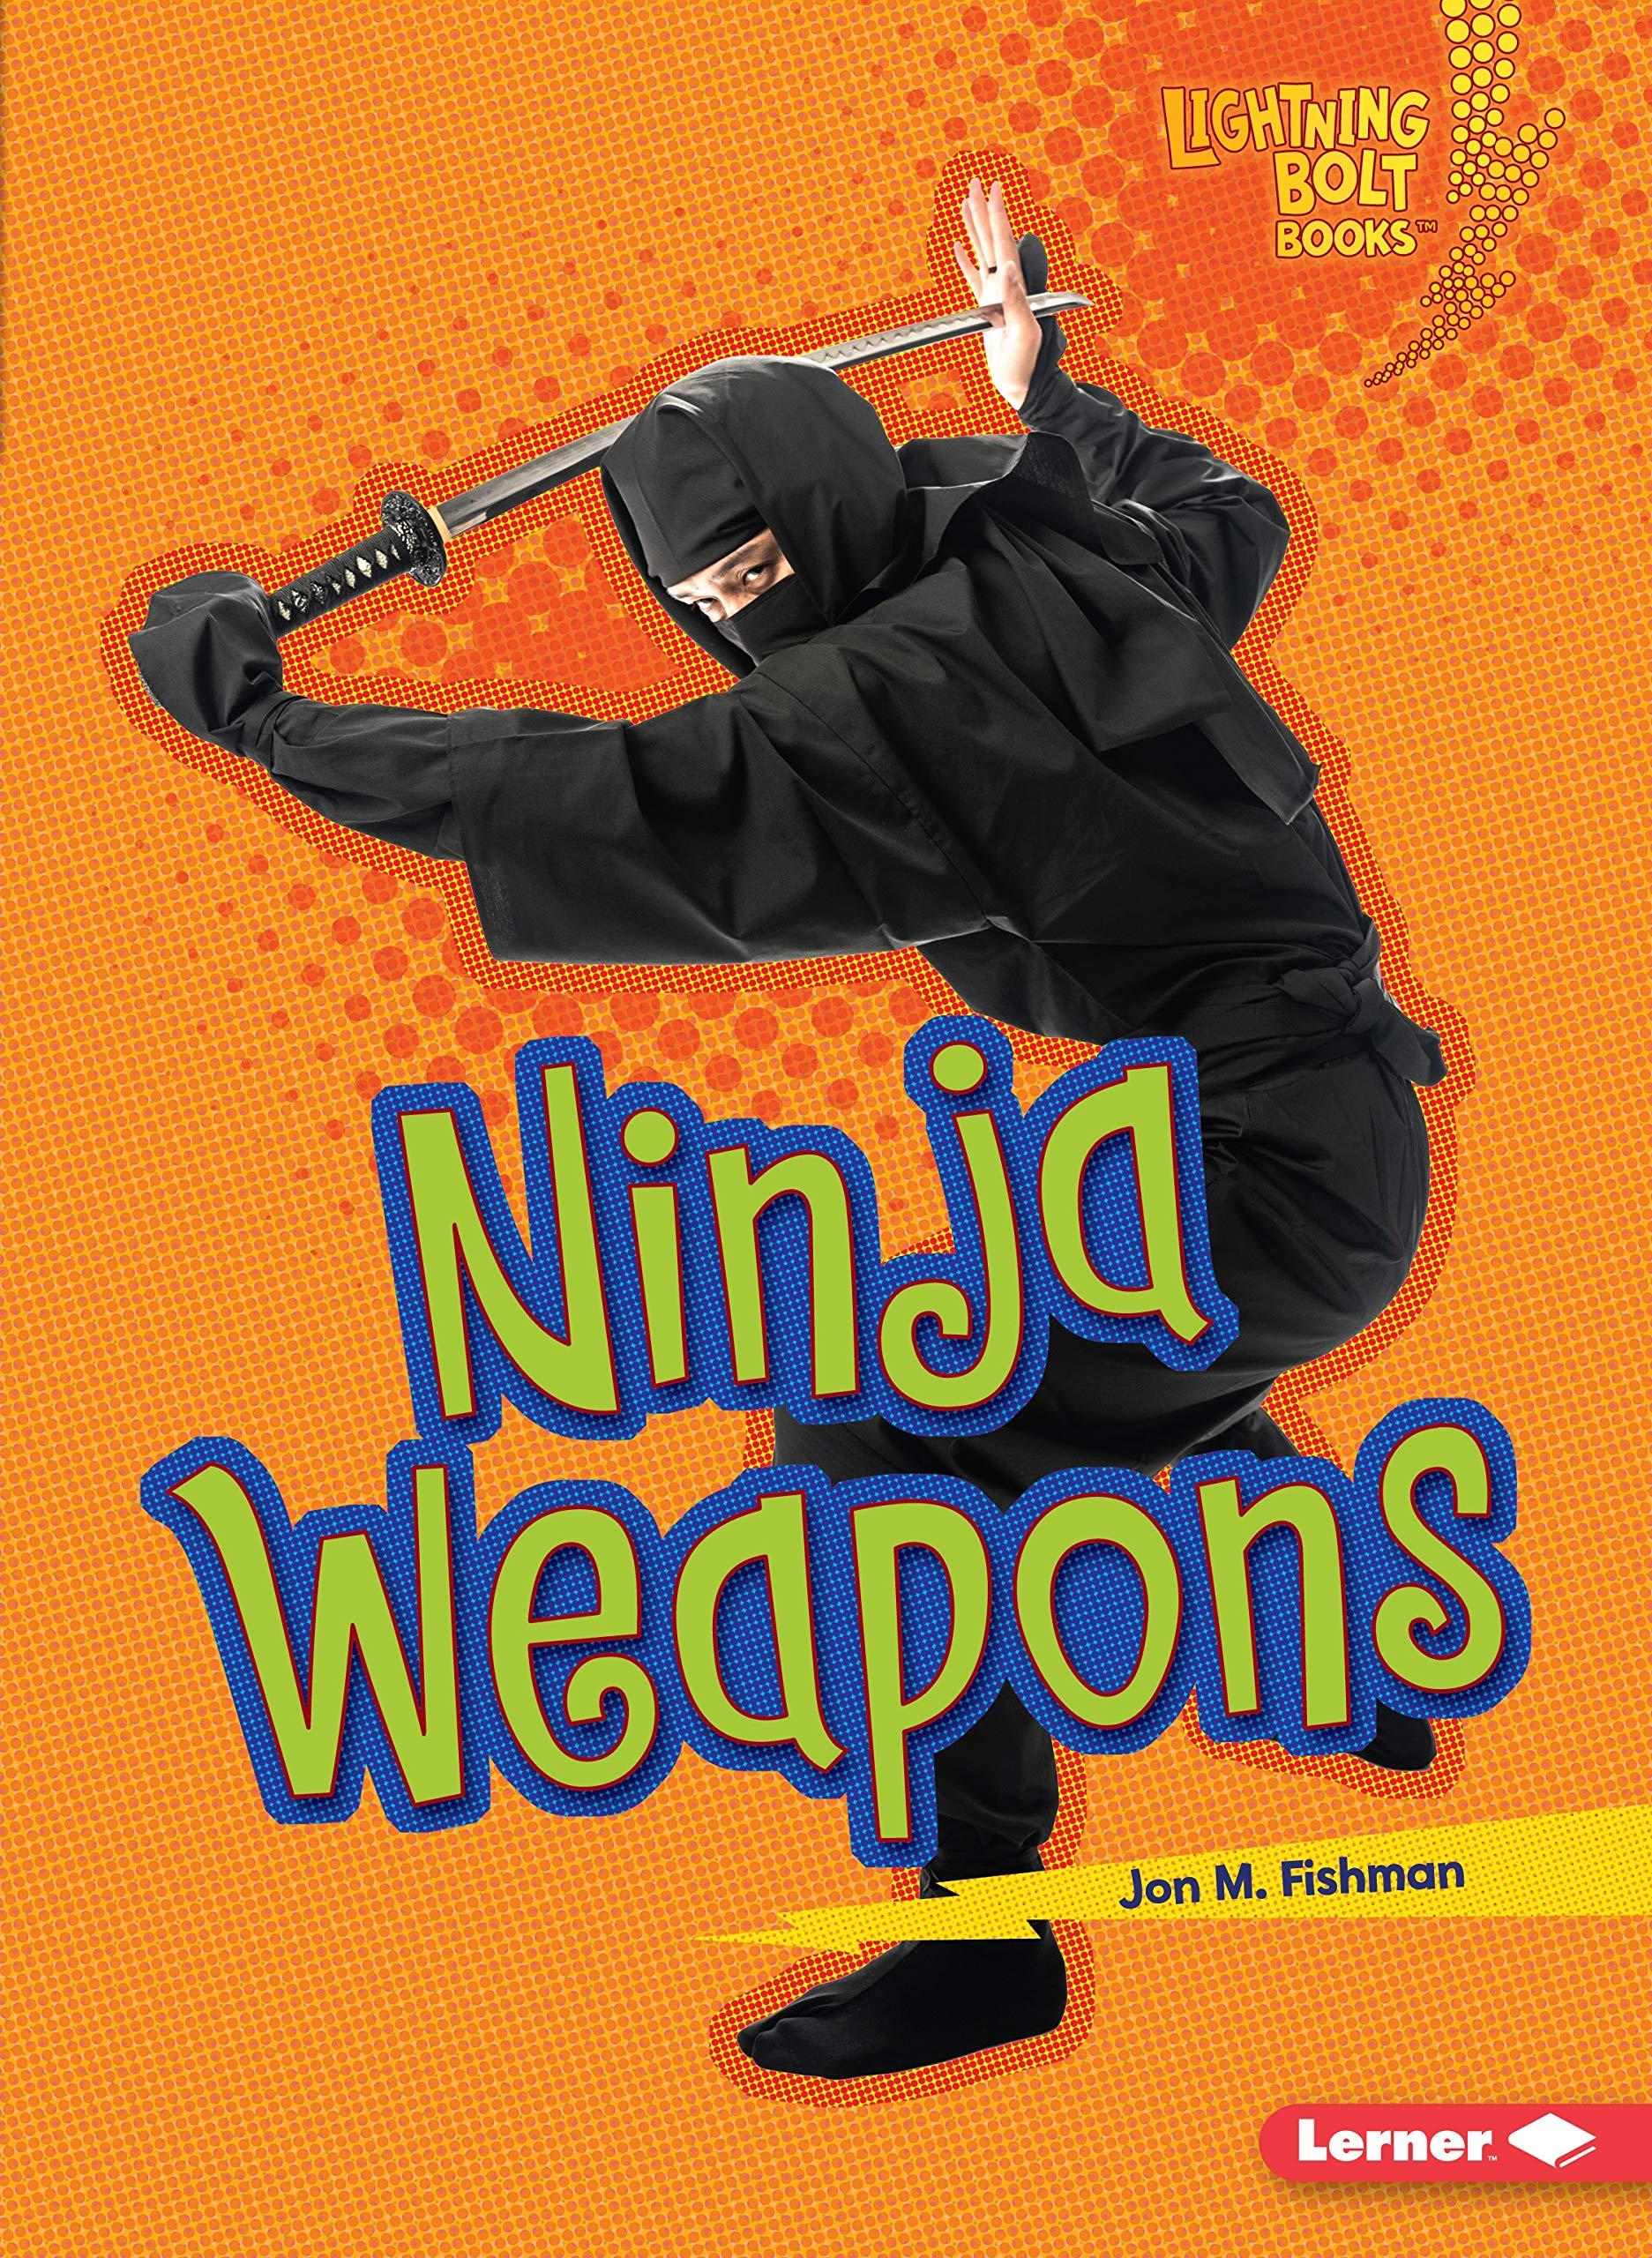 Ninja Weapons (Lightning Bolt Books Ninja Mania): Amazon.es ...